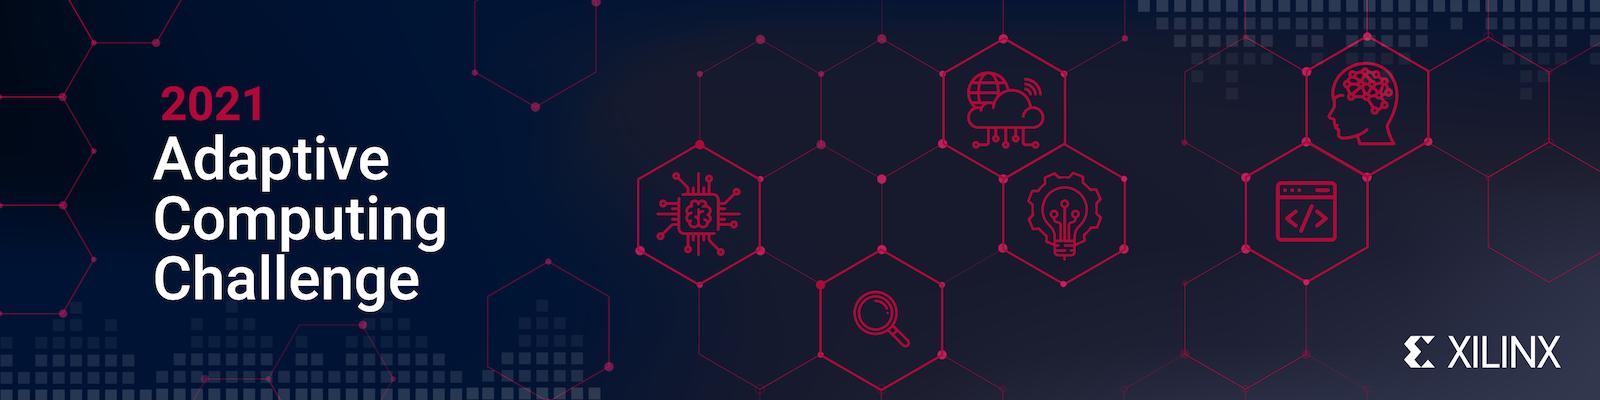 Adaptive Computing Challenge 2021